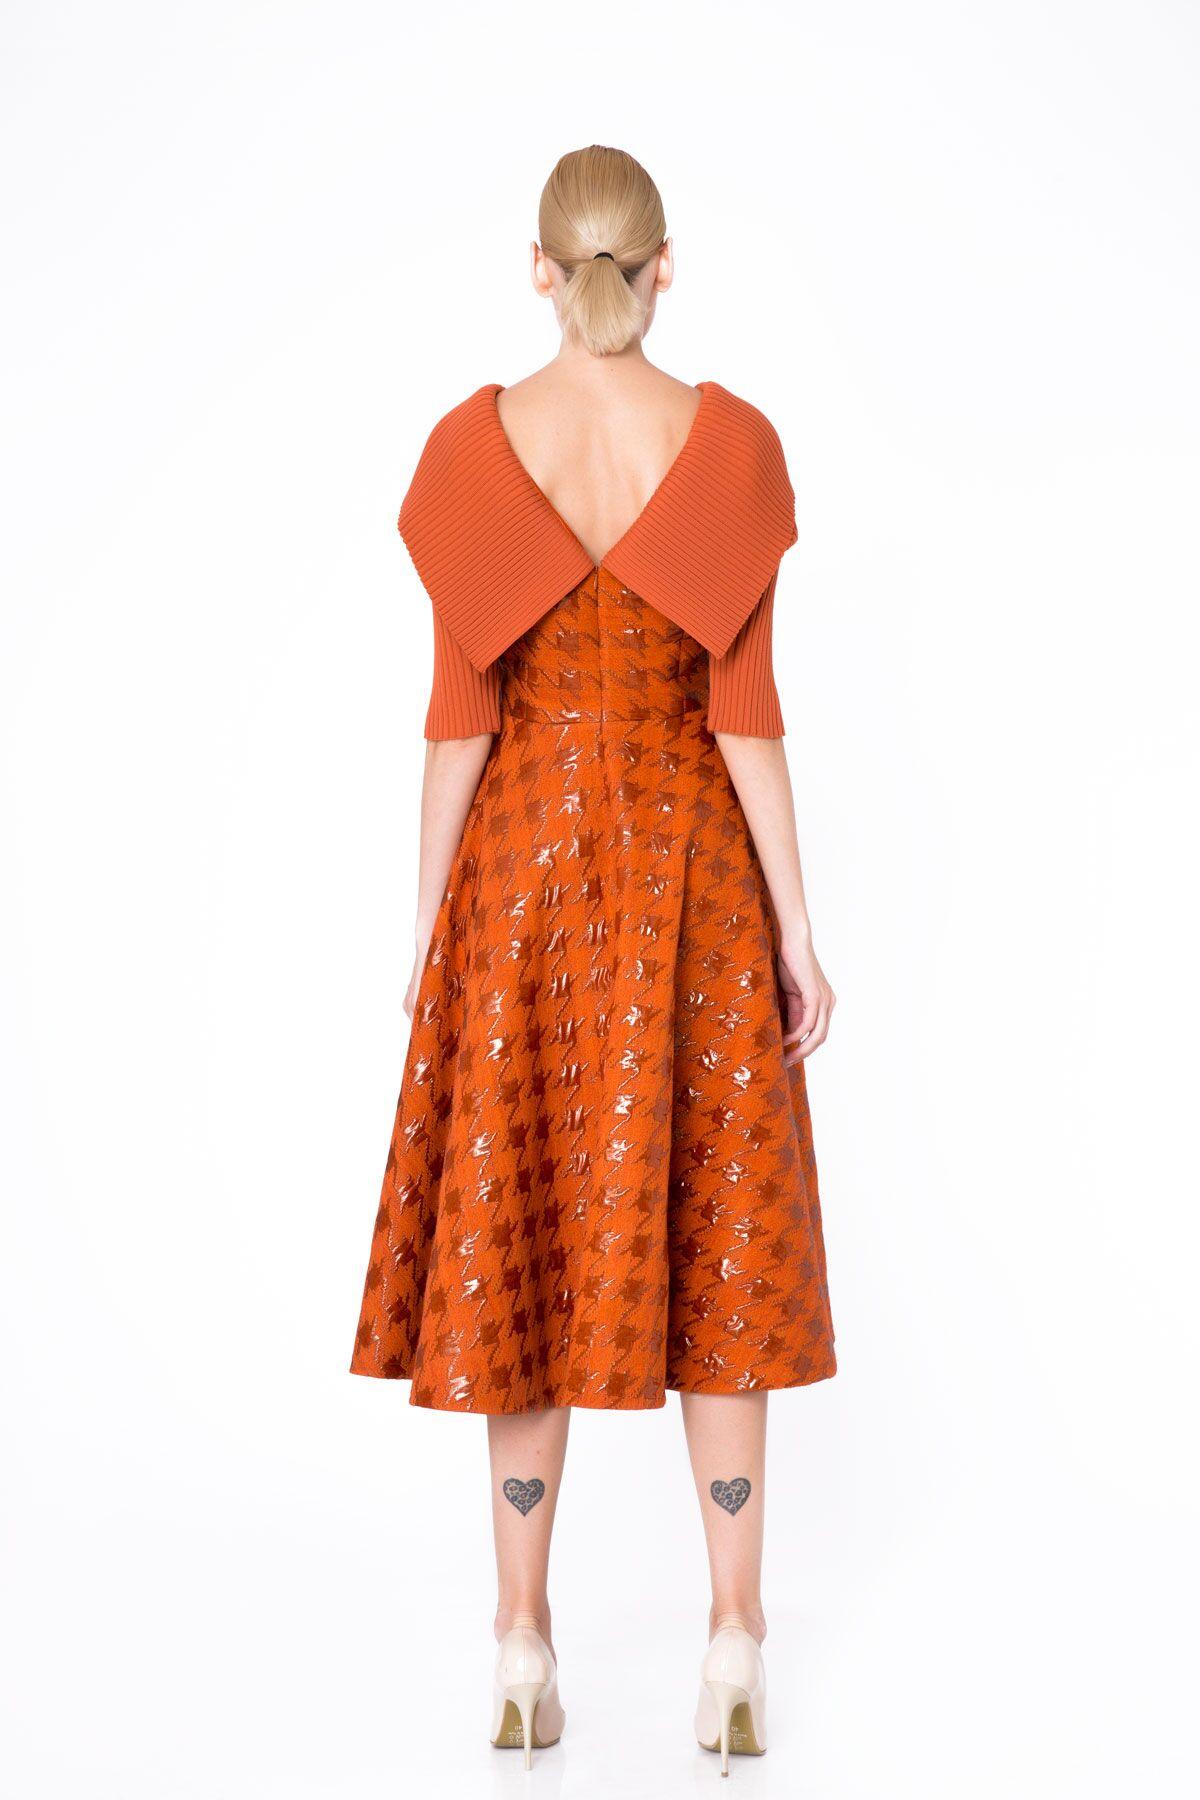 Knitwear Detailed Jacquard Fabric Orange Flared Dress